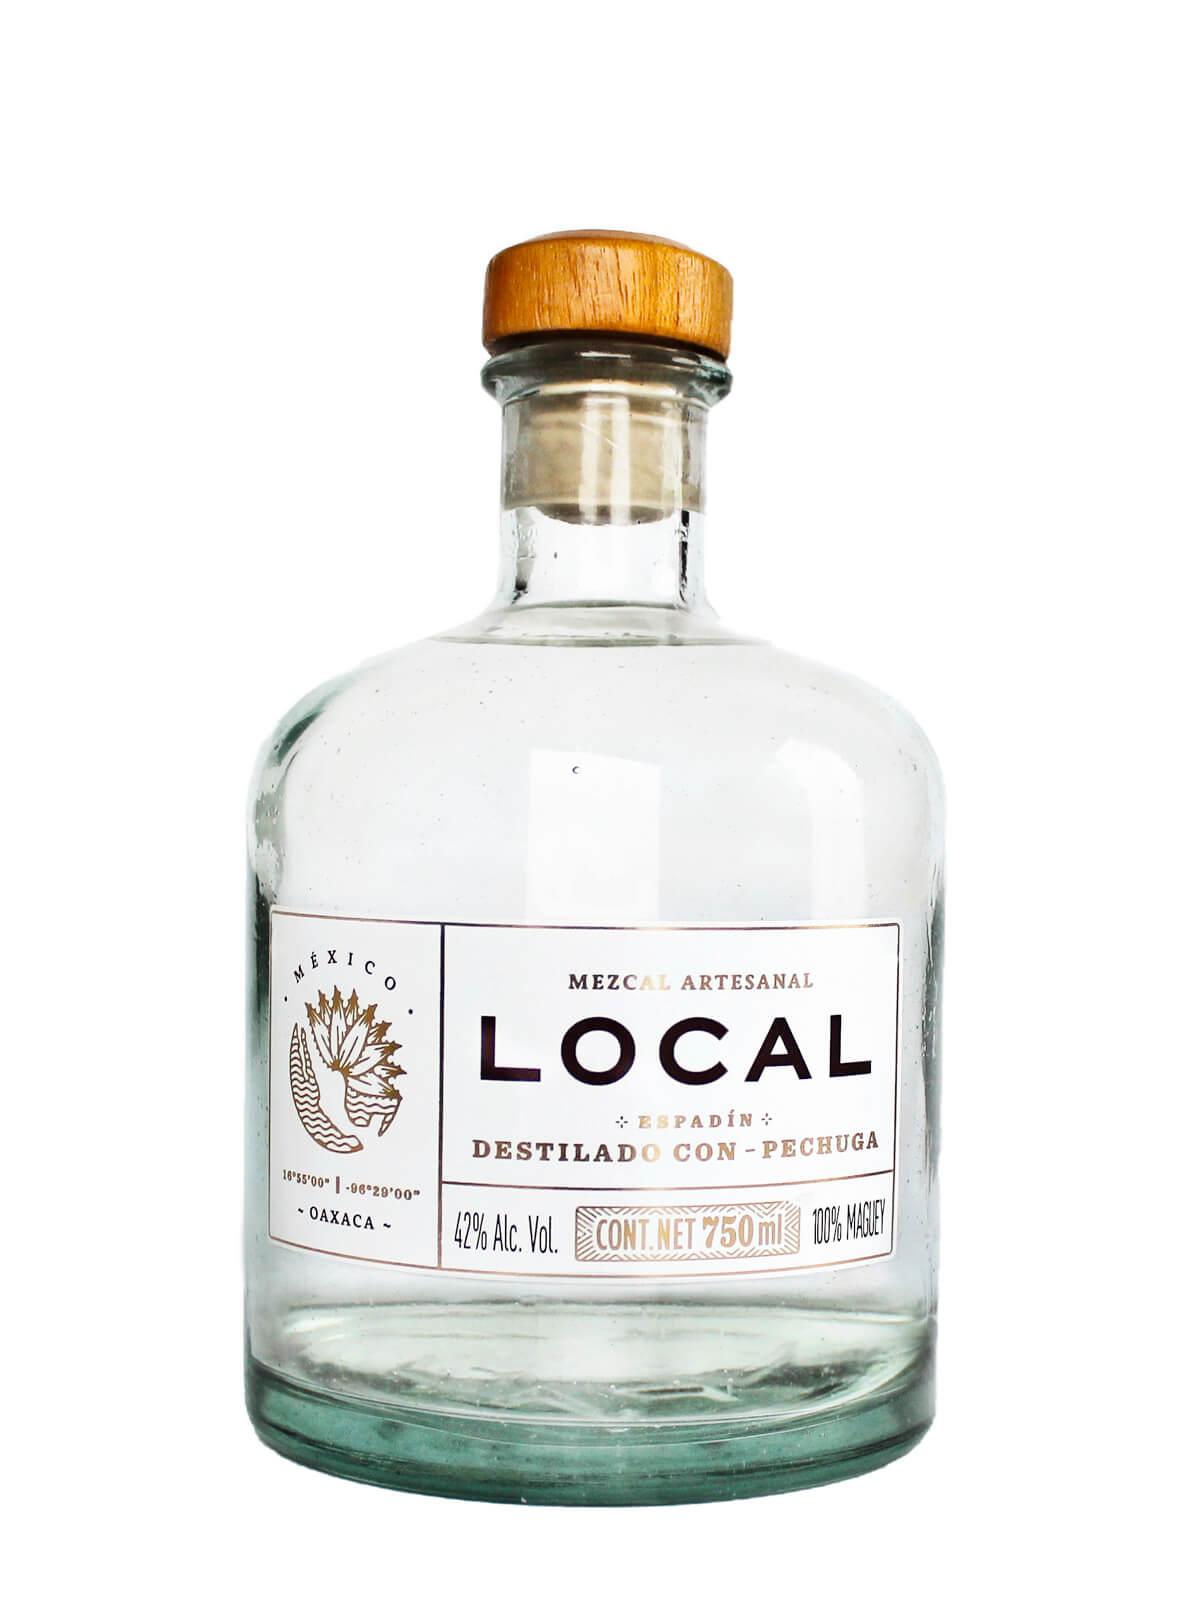 Mezcal Local Pechuga bottle